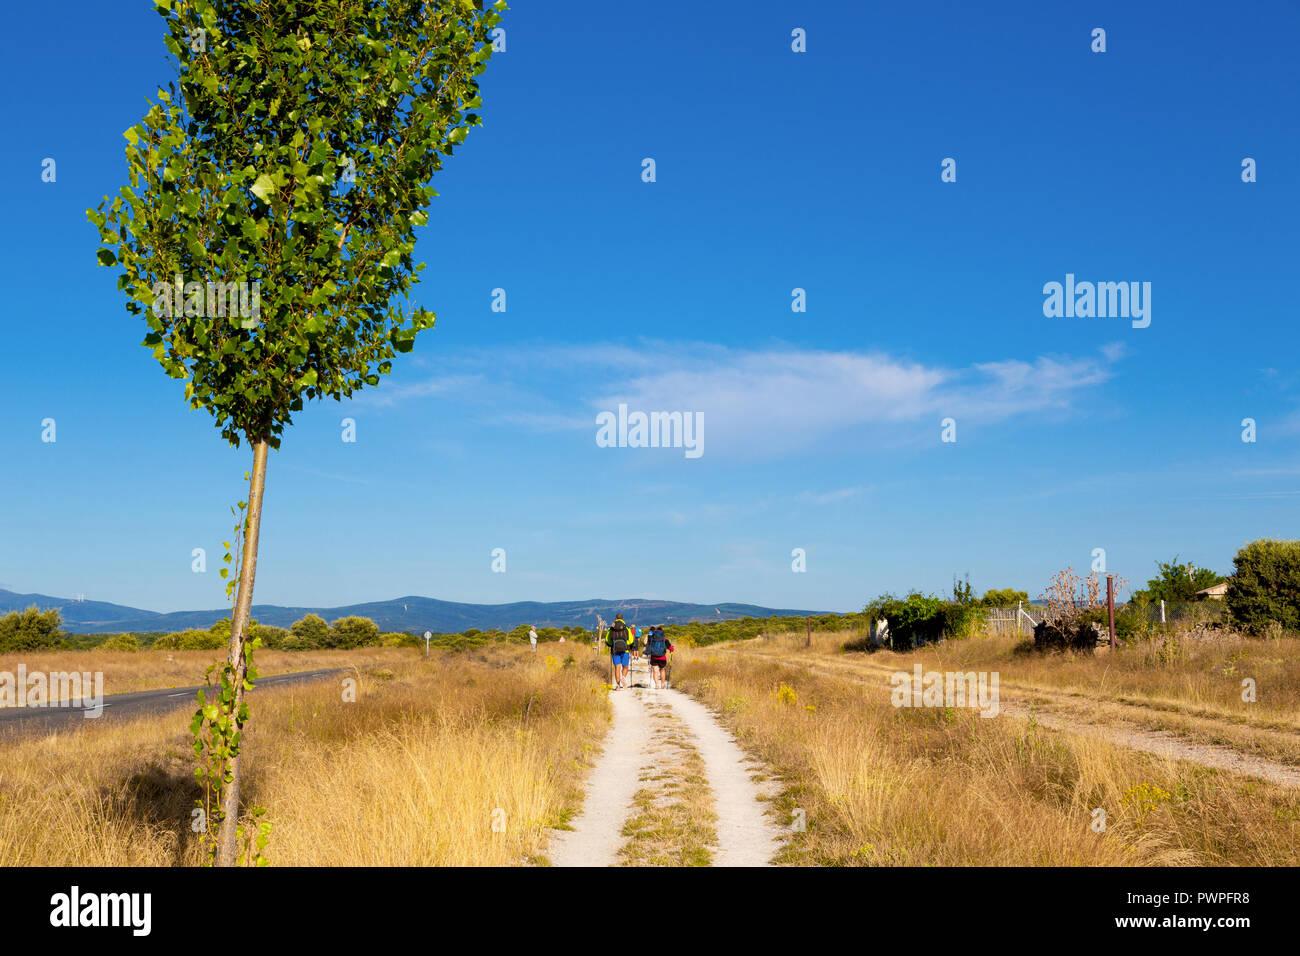 Camino de Santiago (Spain) - Pilgrims along the way of St.James, in the spanish meseta - Stock Image